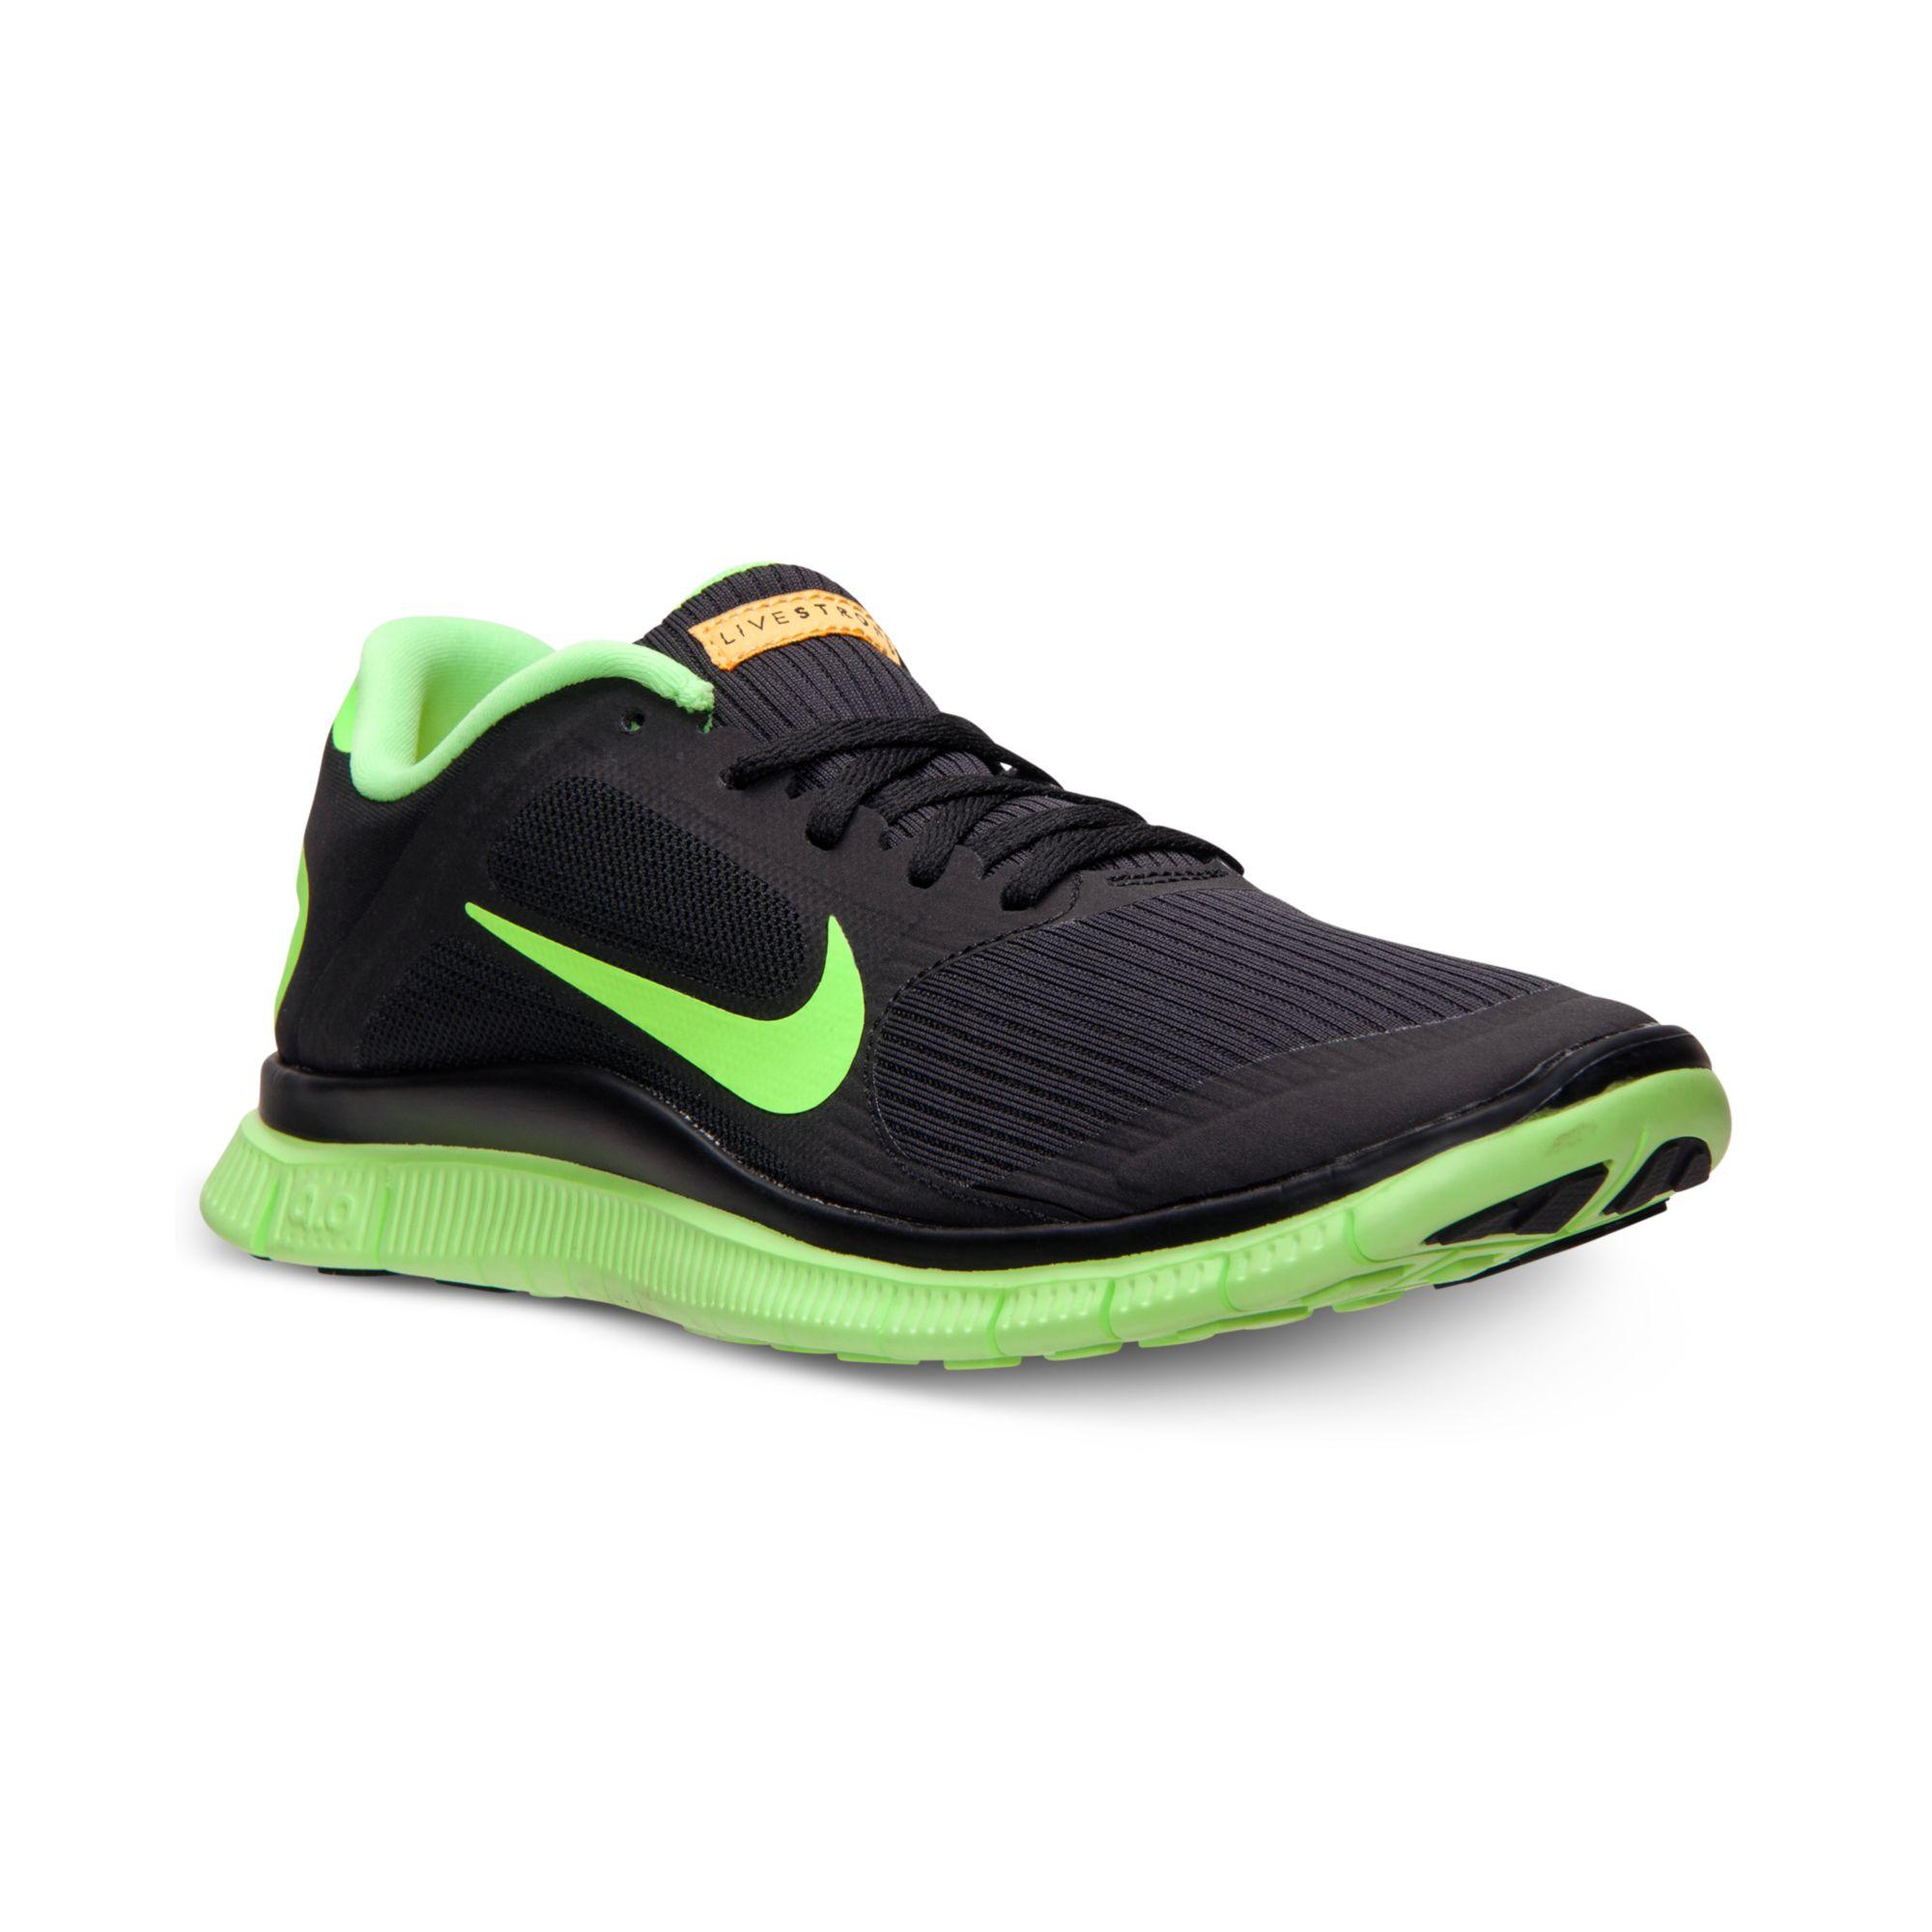 Hommes Nike Free 4.0 V3 Chaussures De Course Bracelets Livestrong